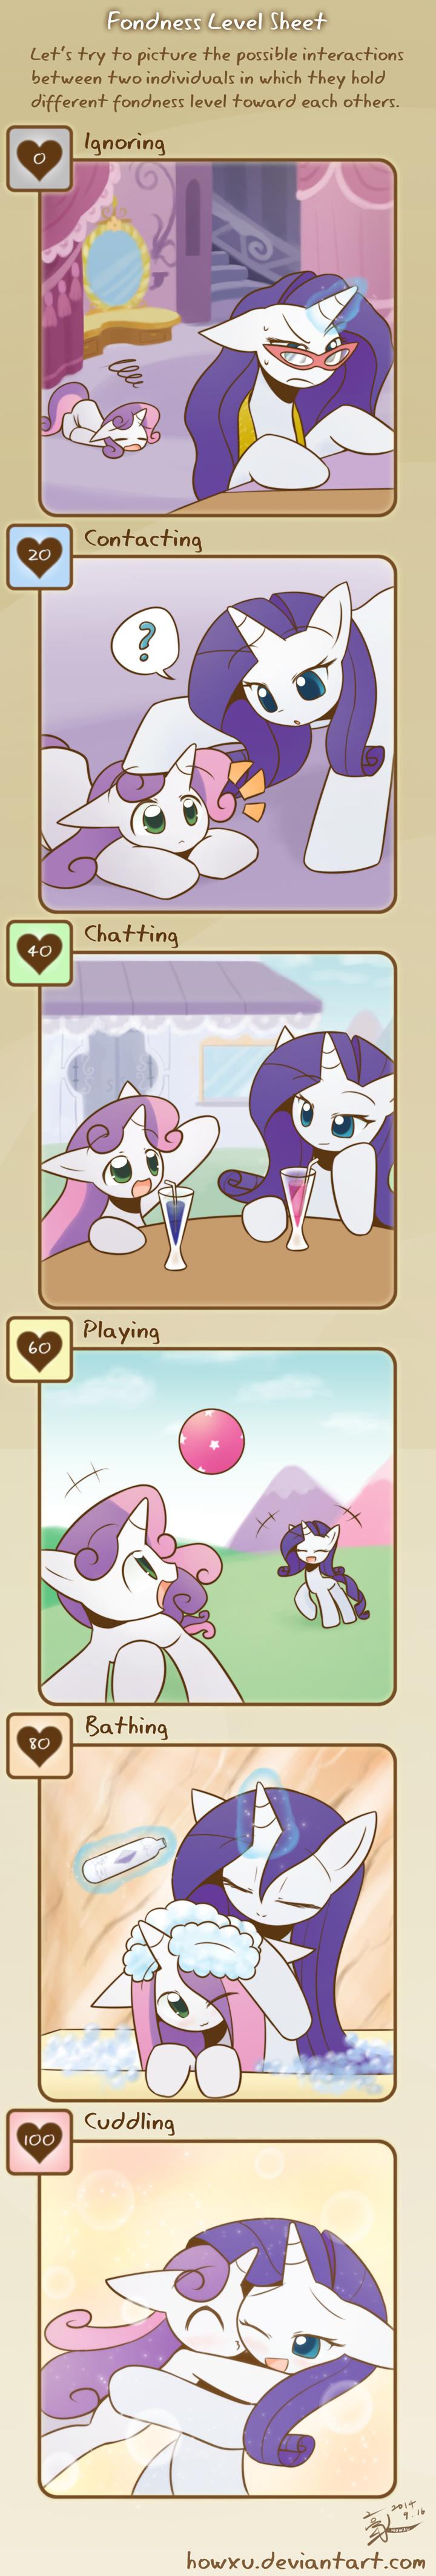 Fondness level of unicorn sisters